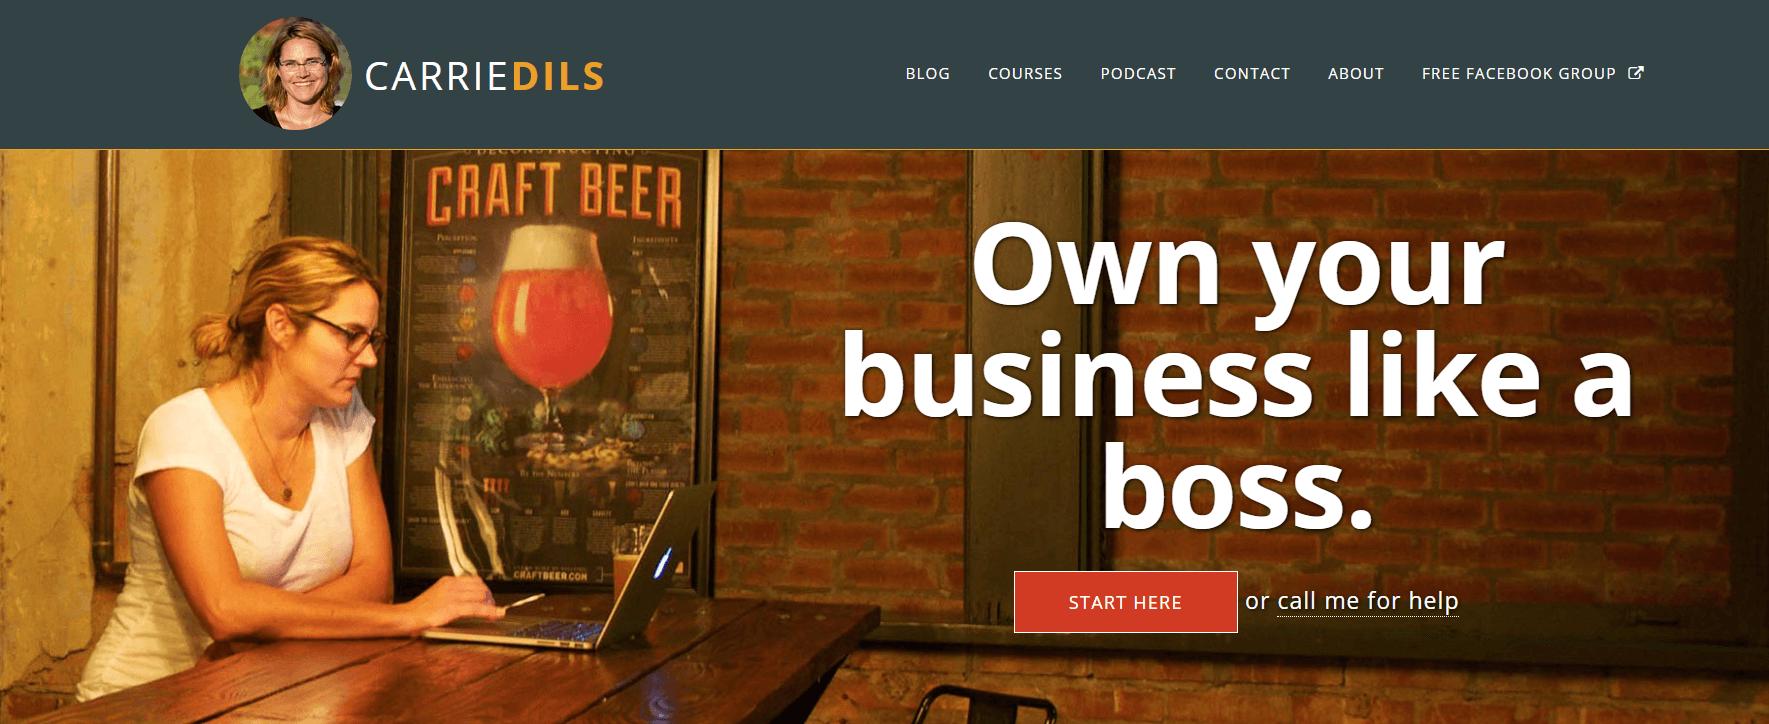 An example of a freelance WordPress website